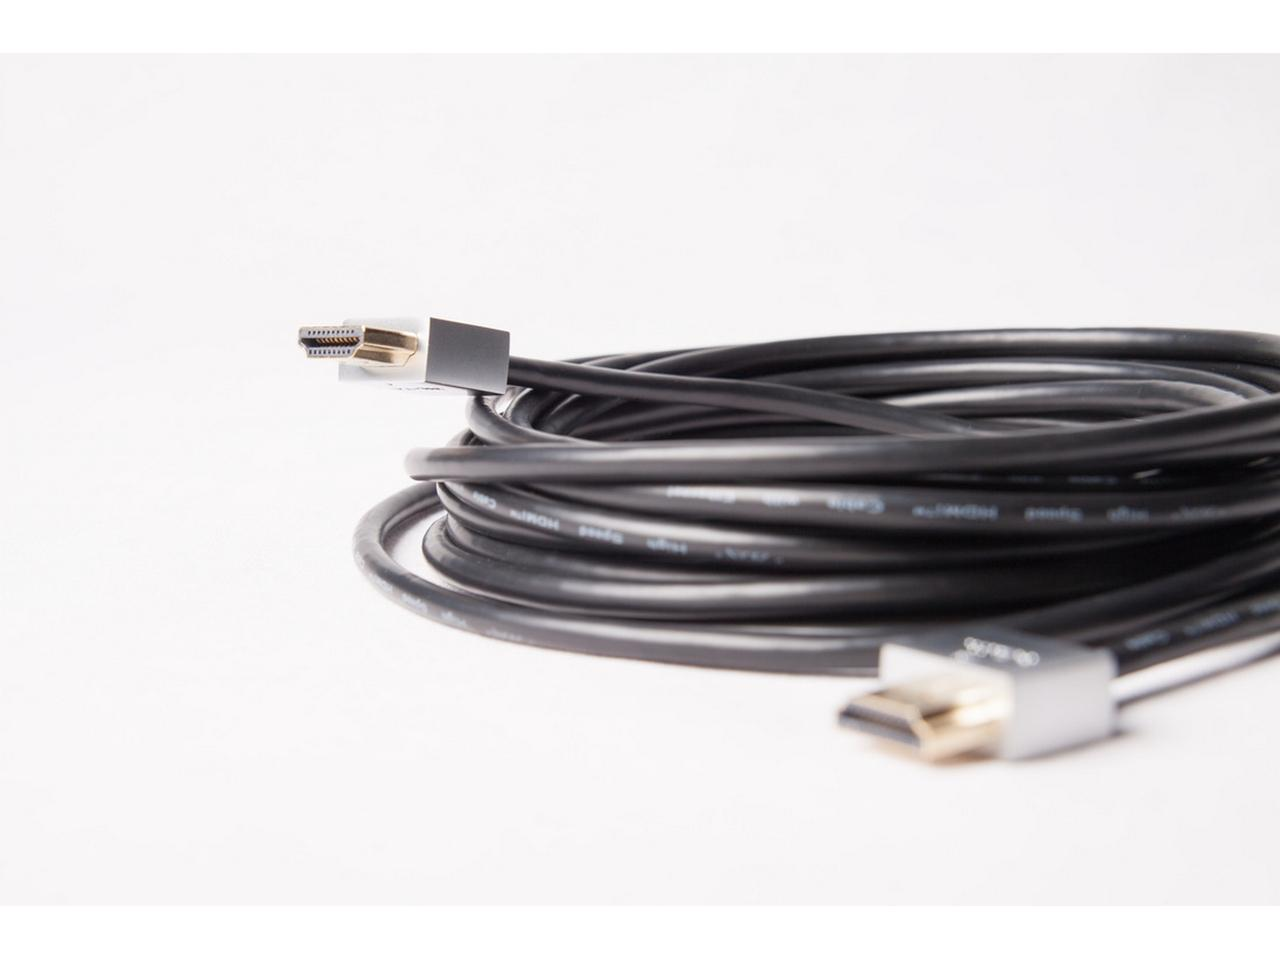 ZHSC-0.5M 4K High Speed Round HDMI Cable - 0.5m by Zigen